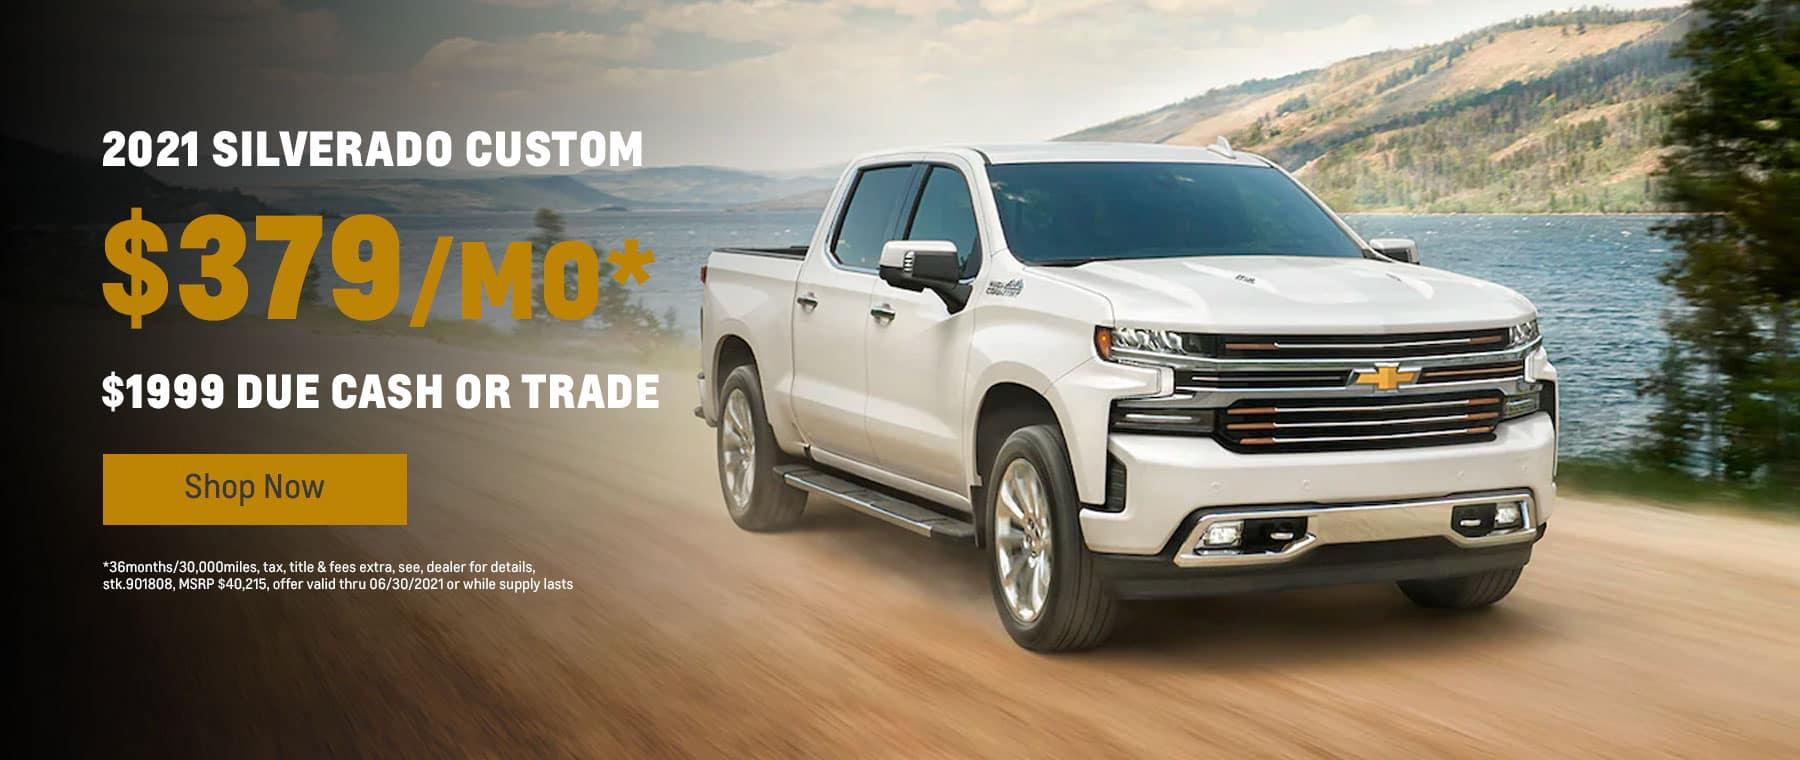 2021 Silverado Custom $379mo.* $1999 due cash or trade